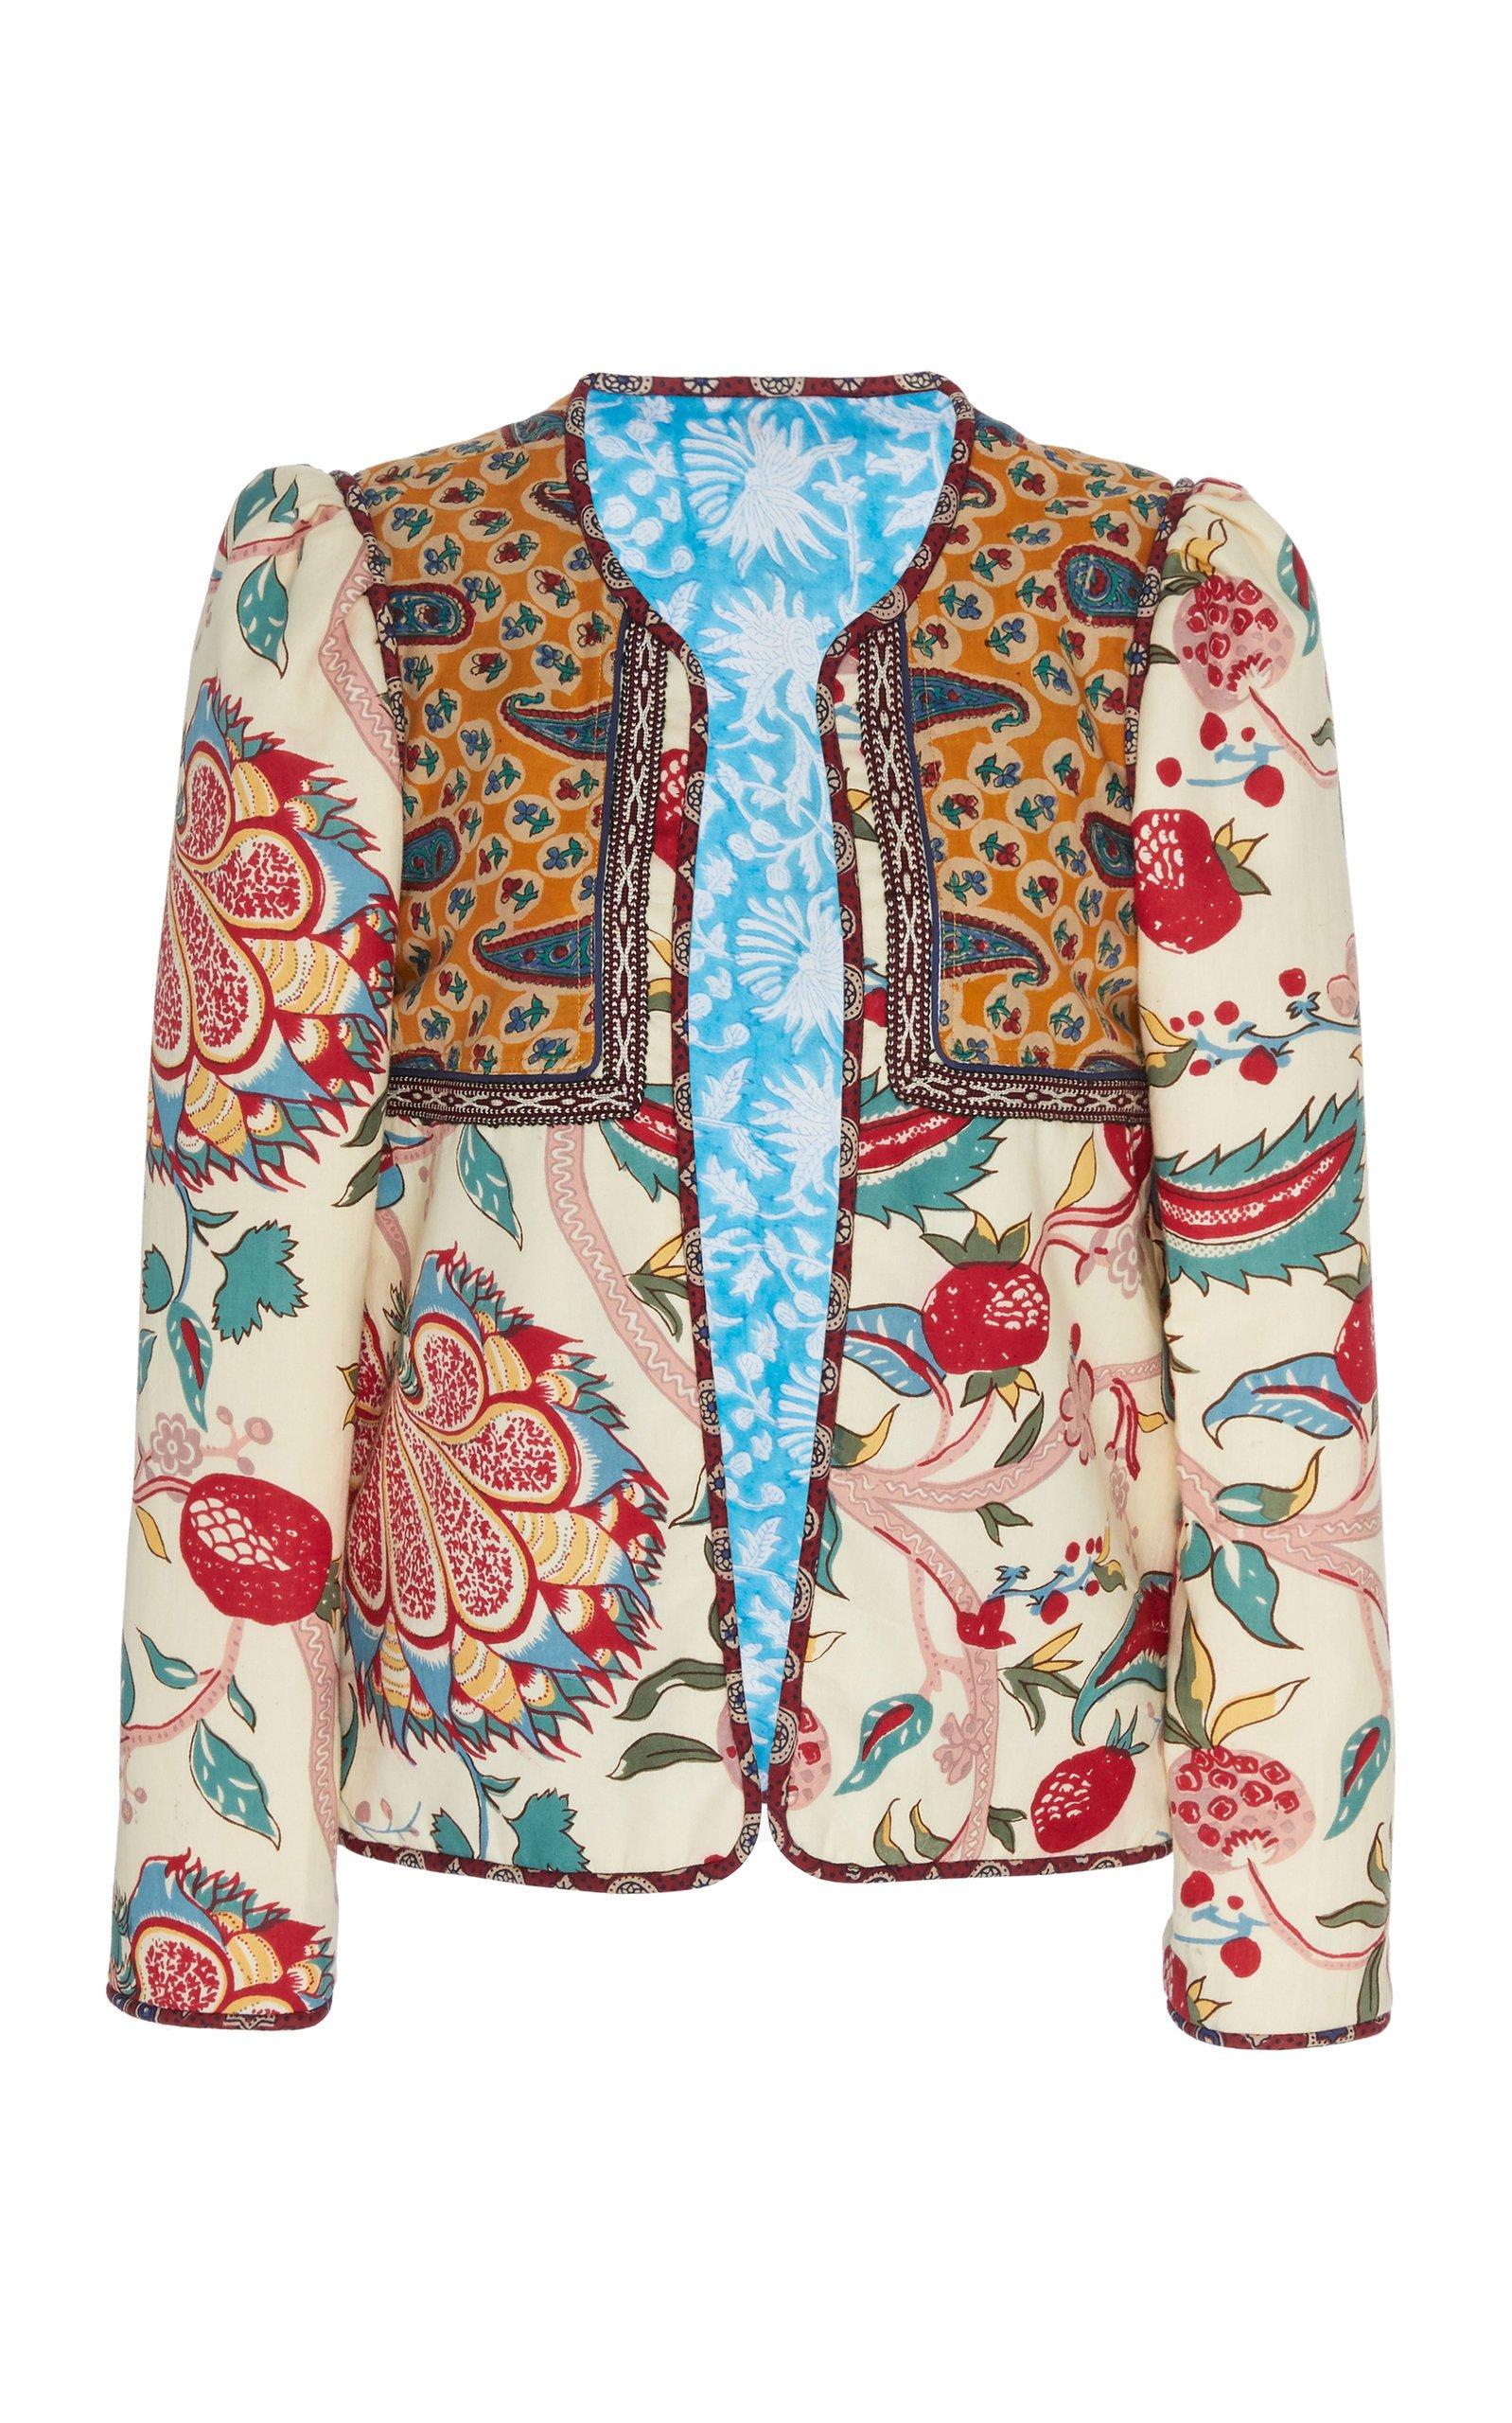 Alix of Bohemia Pomegranate Cotton Jacket Size: S